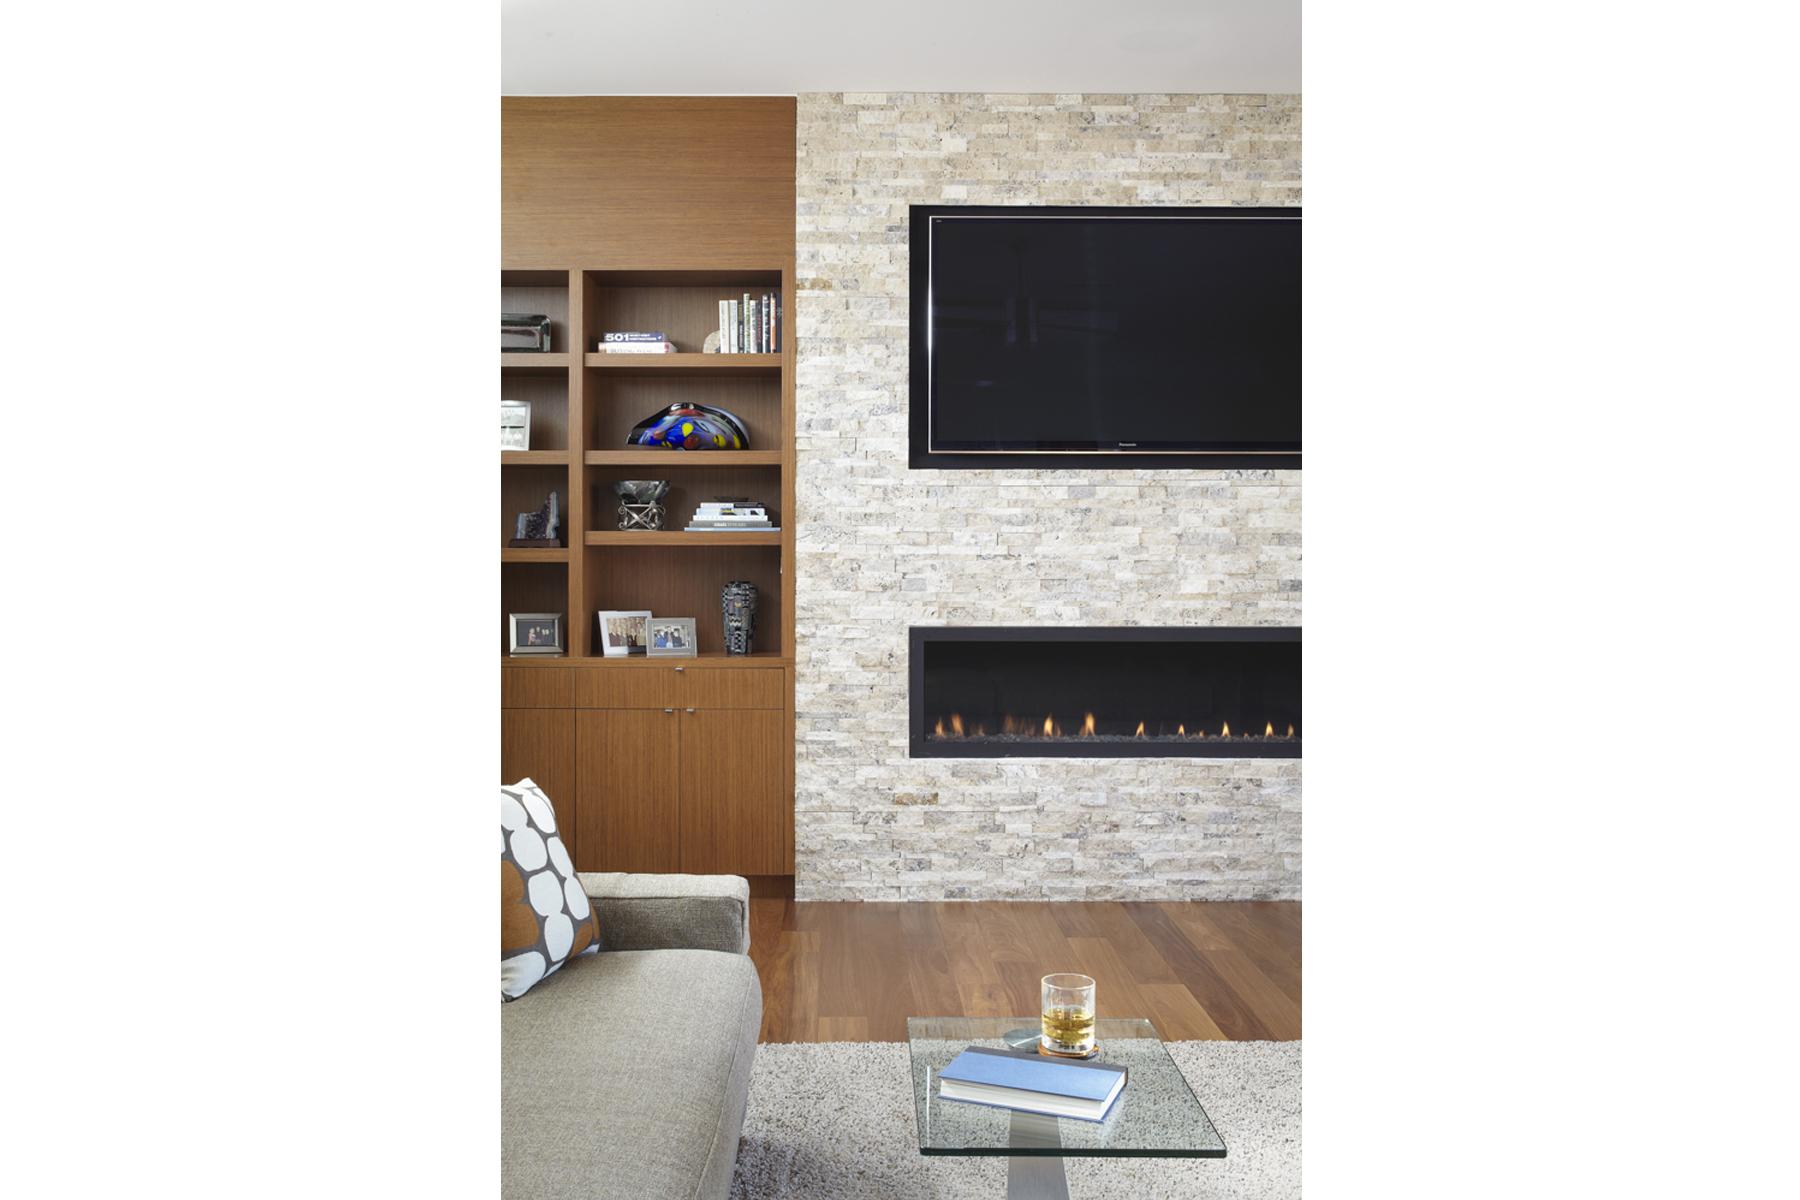 ridgewood-5-living-room-details